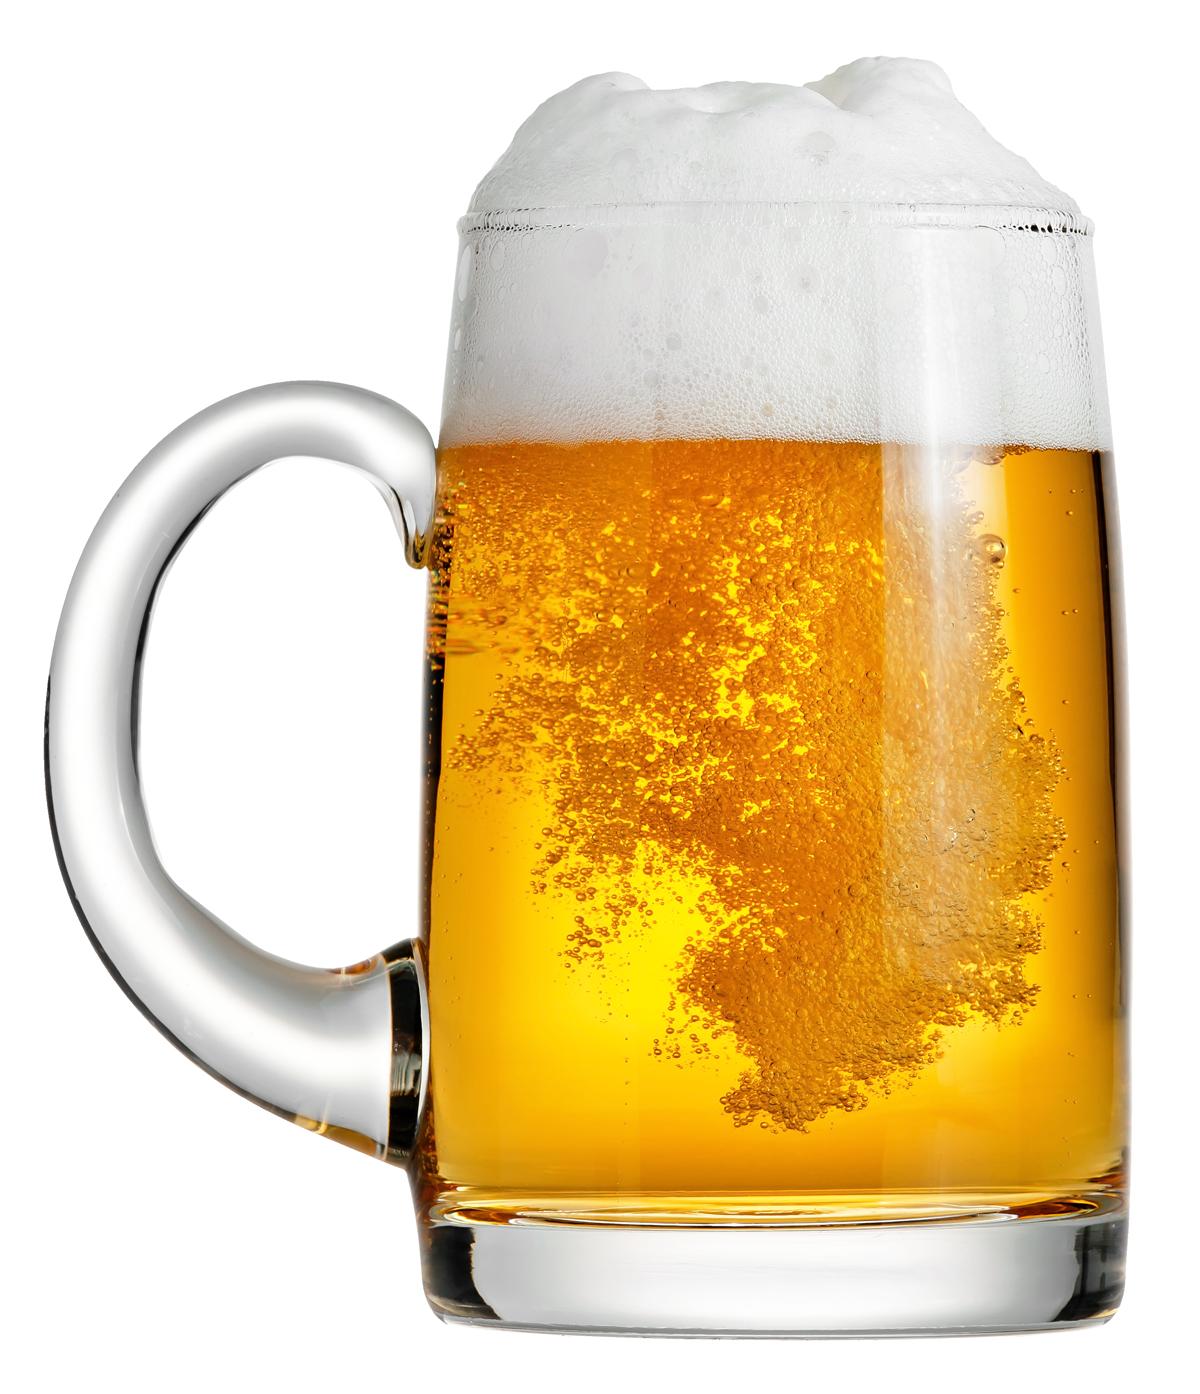 Beer Mug PNG Image.